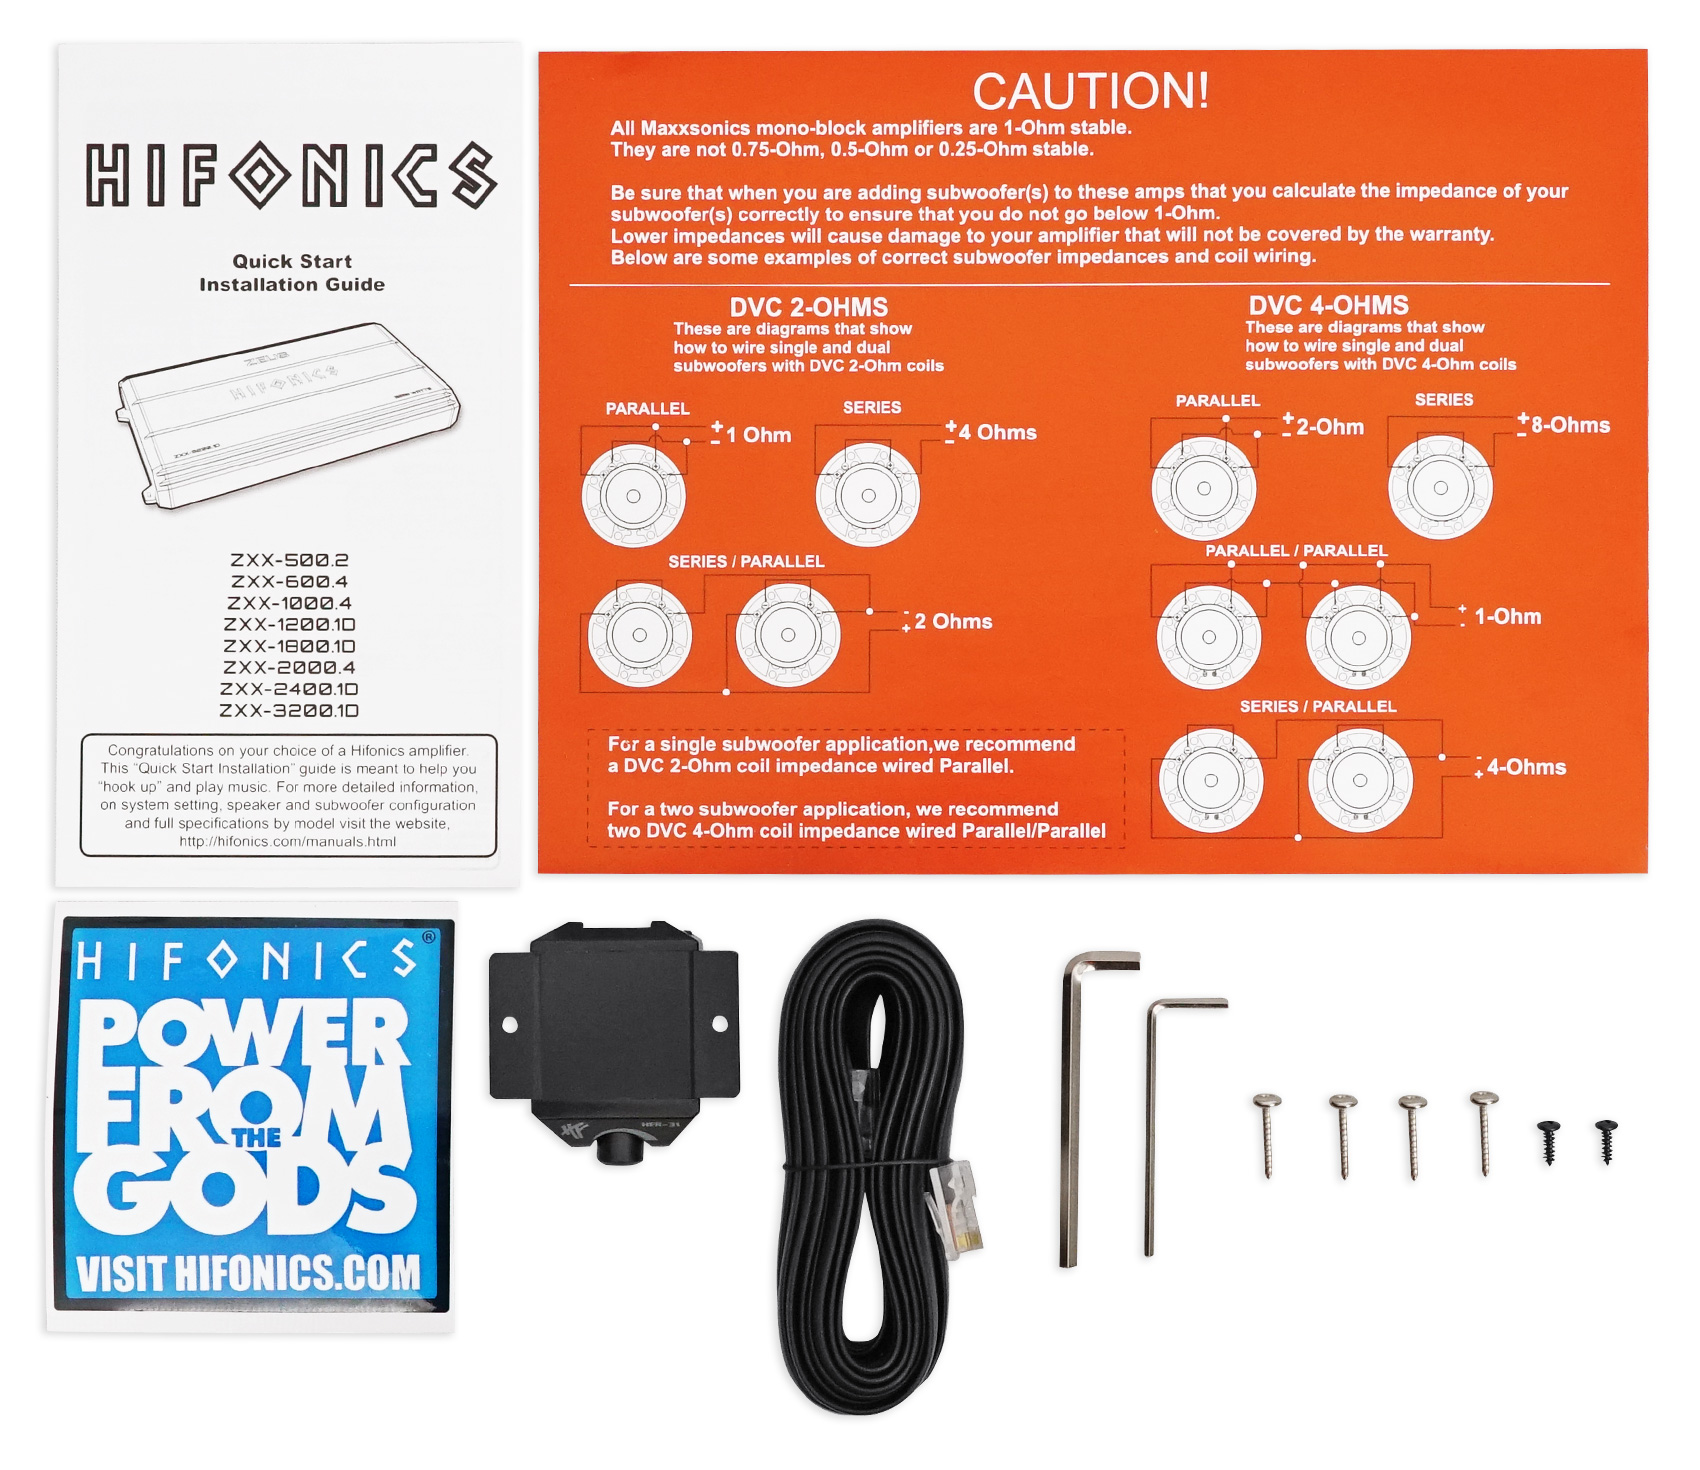 Hifonics Zeus Zxx 32001d 3200 Watt Rms Mono Class D Car Audio Amp Wiring Diagram Amplifier Kit